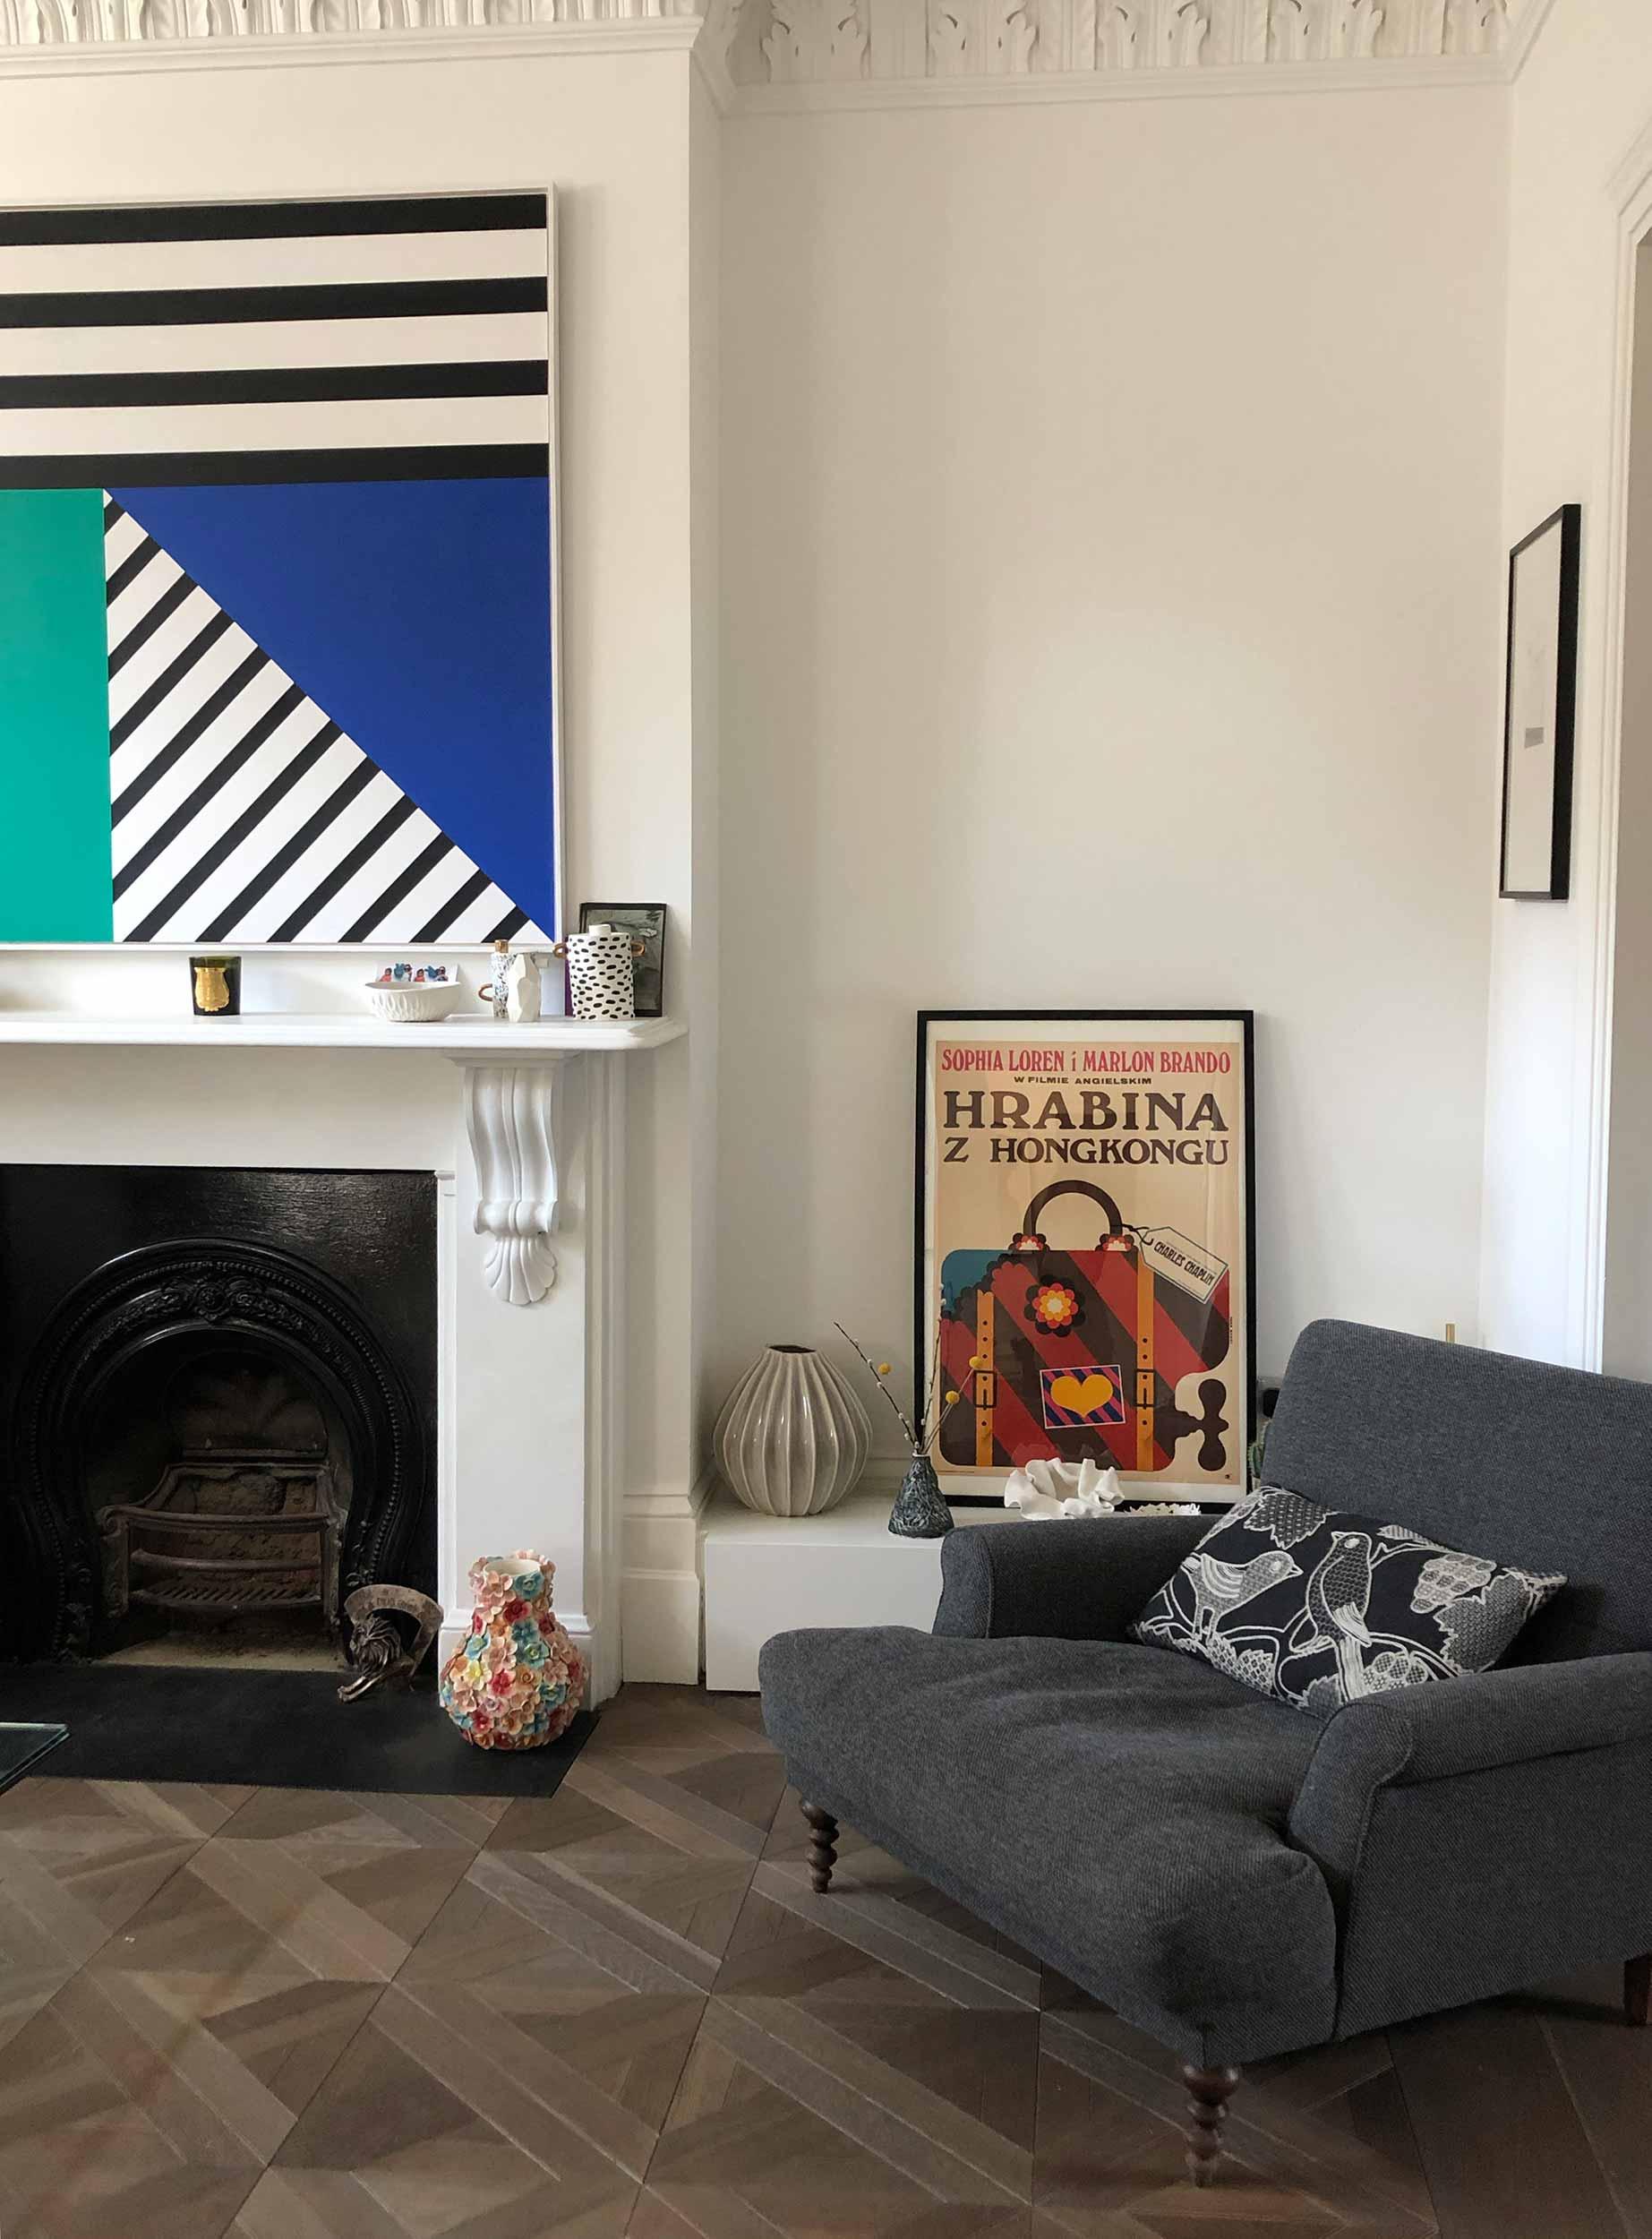 HRABINA - O LIVING ROOM.jpg